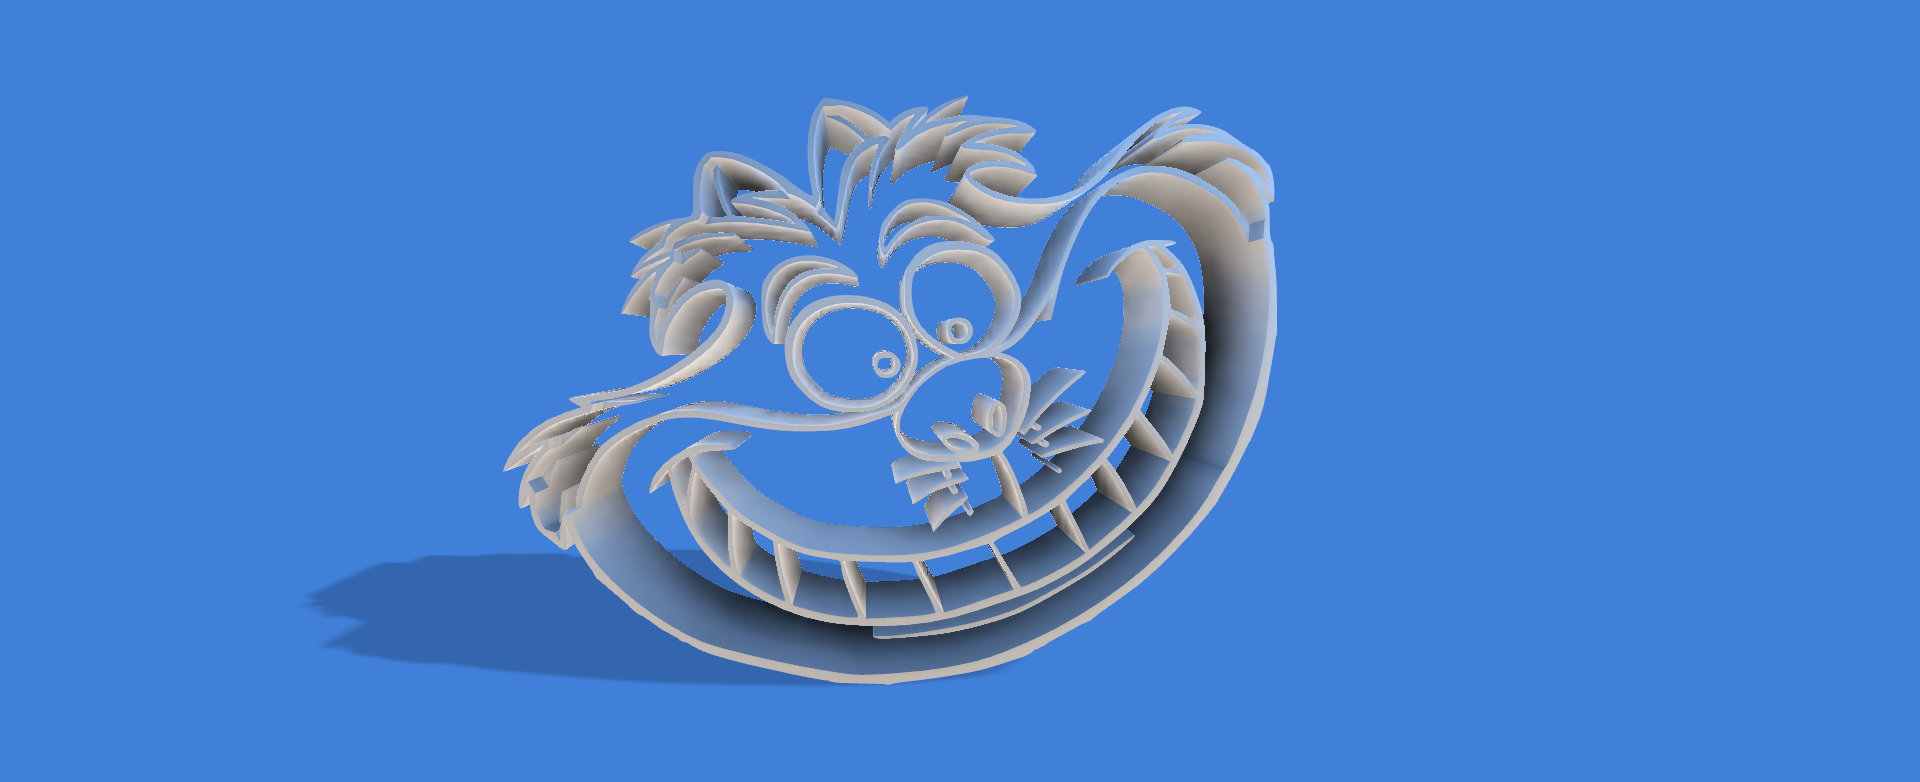 cara de sonriente v1.png Download STL file Smiling Alicia cookie cutter • 3D print object, Geralp